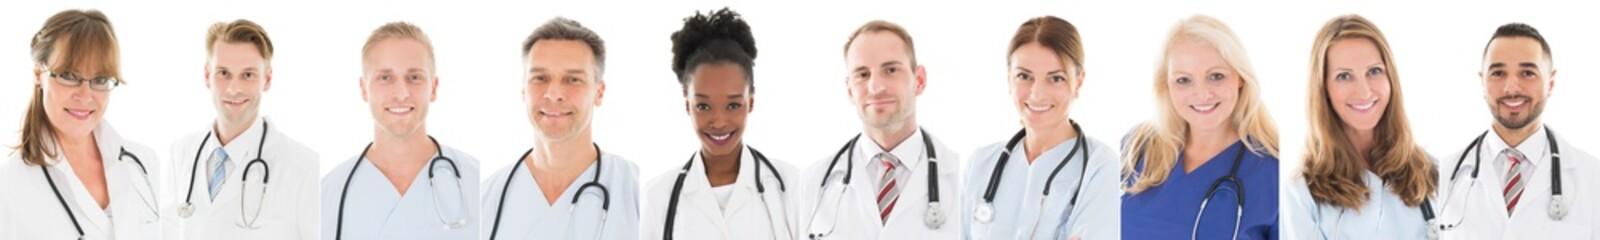 Smiling Medical Staff